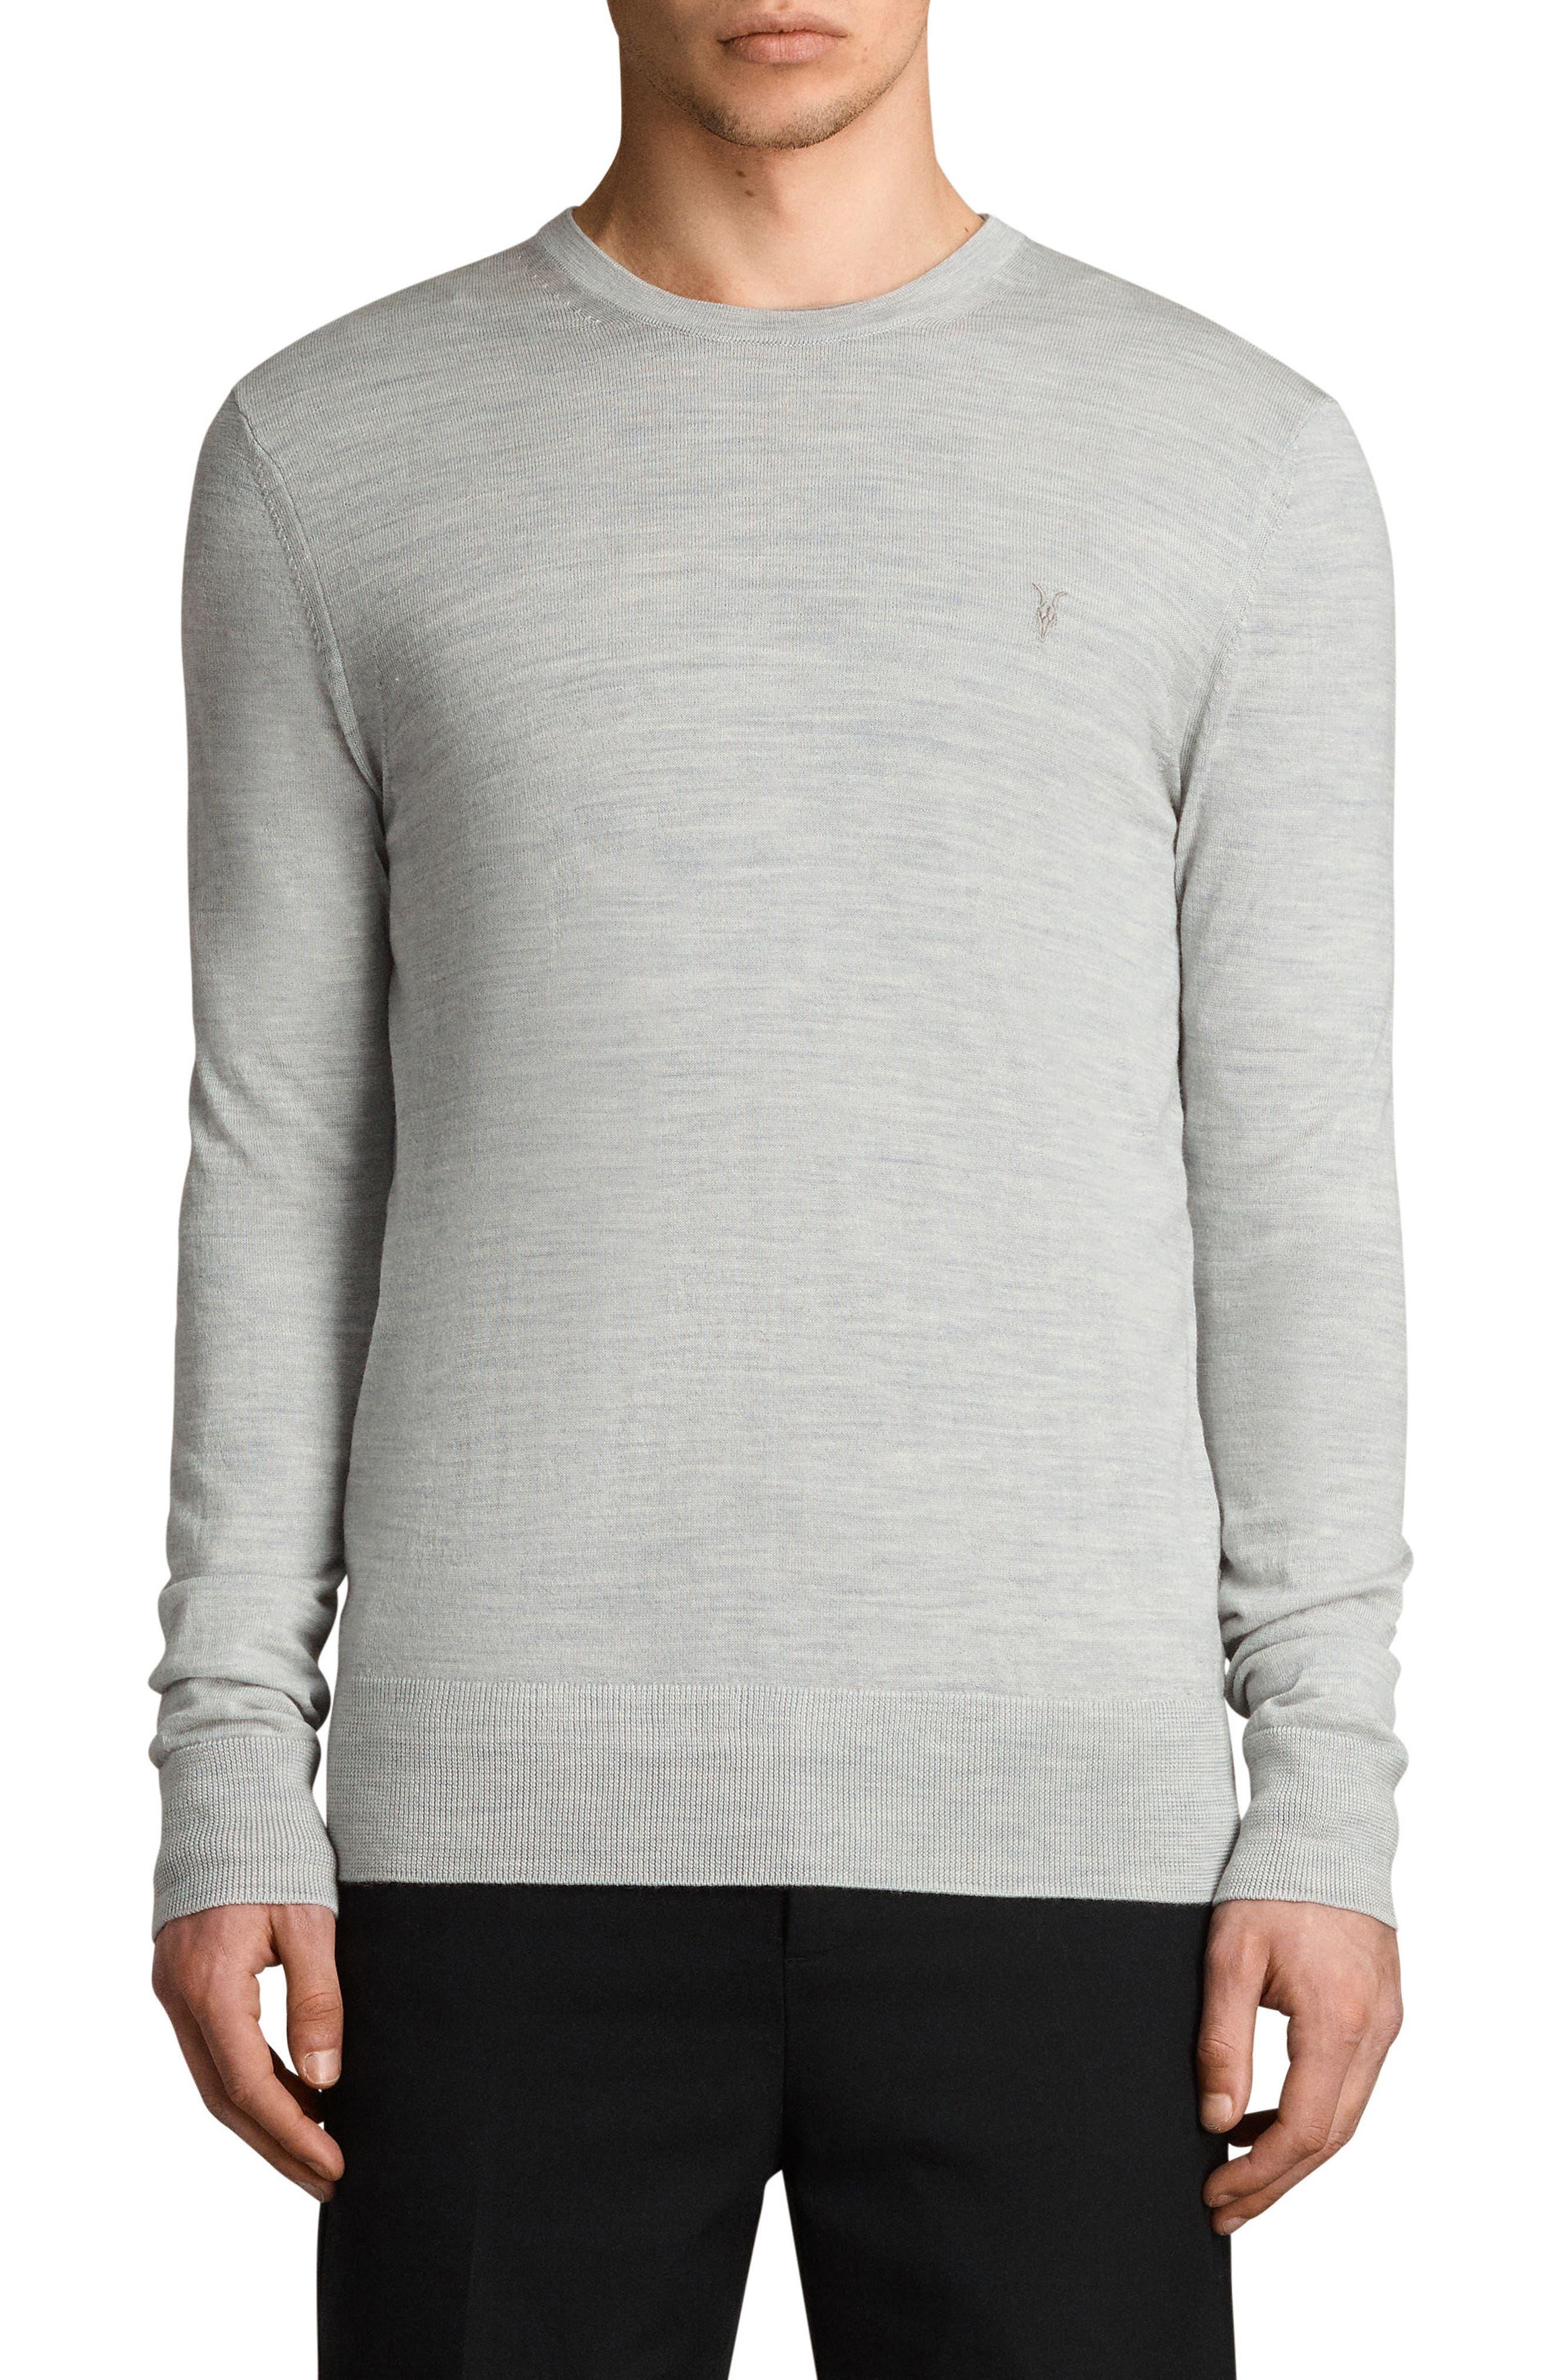 Mode Slim Fit Merino Wool Sweater,                             Main thumbnail 1, color,                             Light Grey Marl